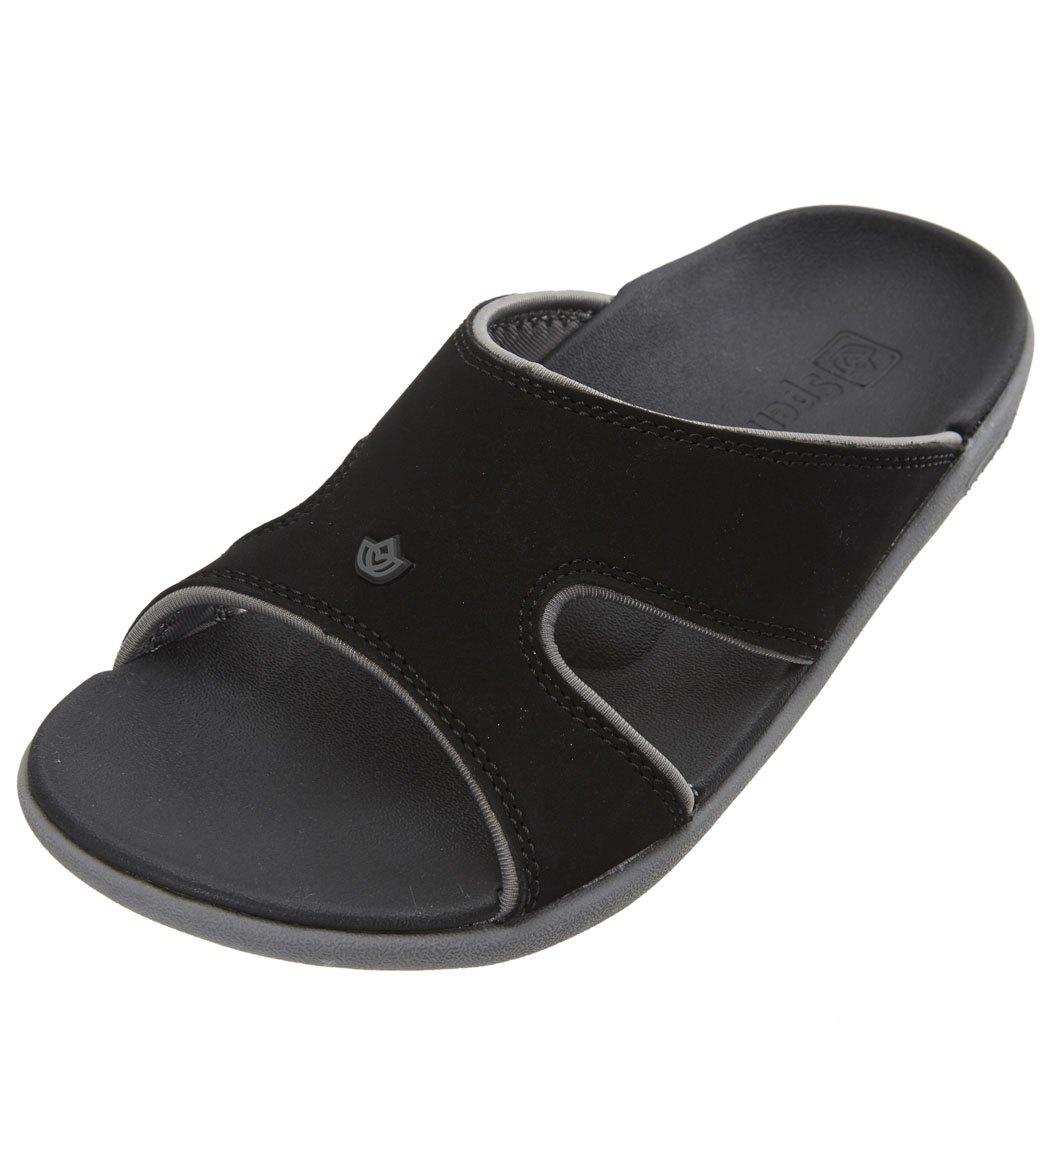 Sandal Slide Women's Kholo Plus Spenco nw80kXOZNP